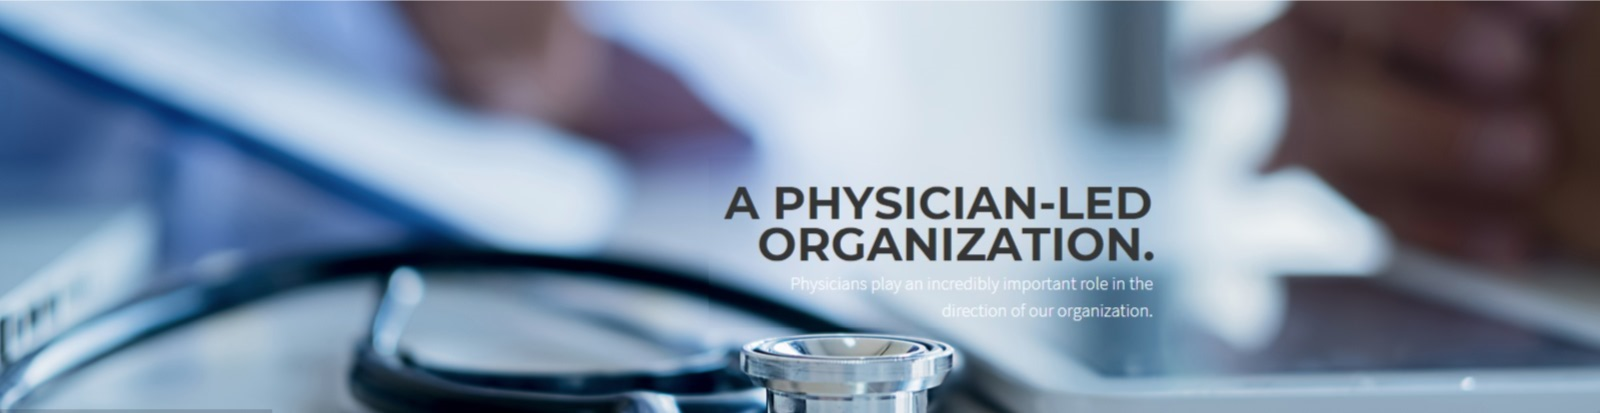 A physician-led organization